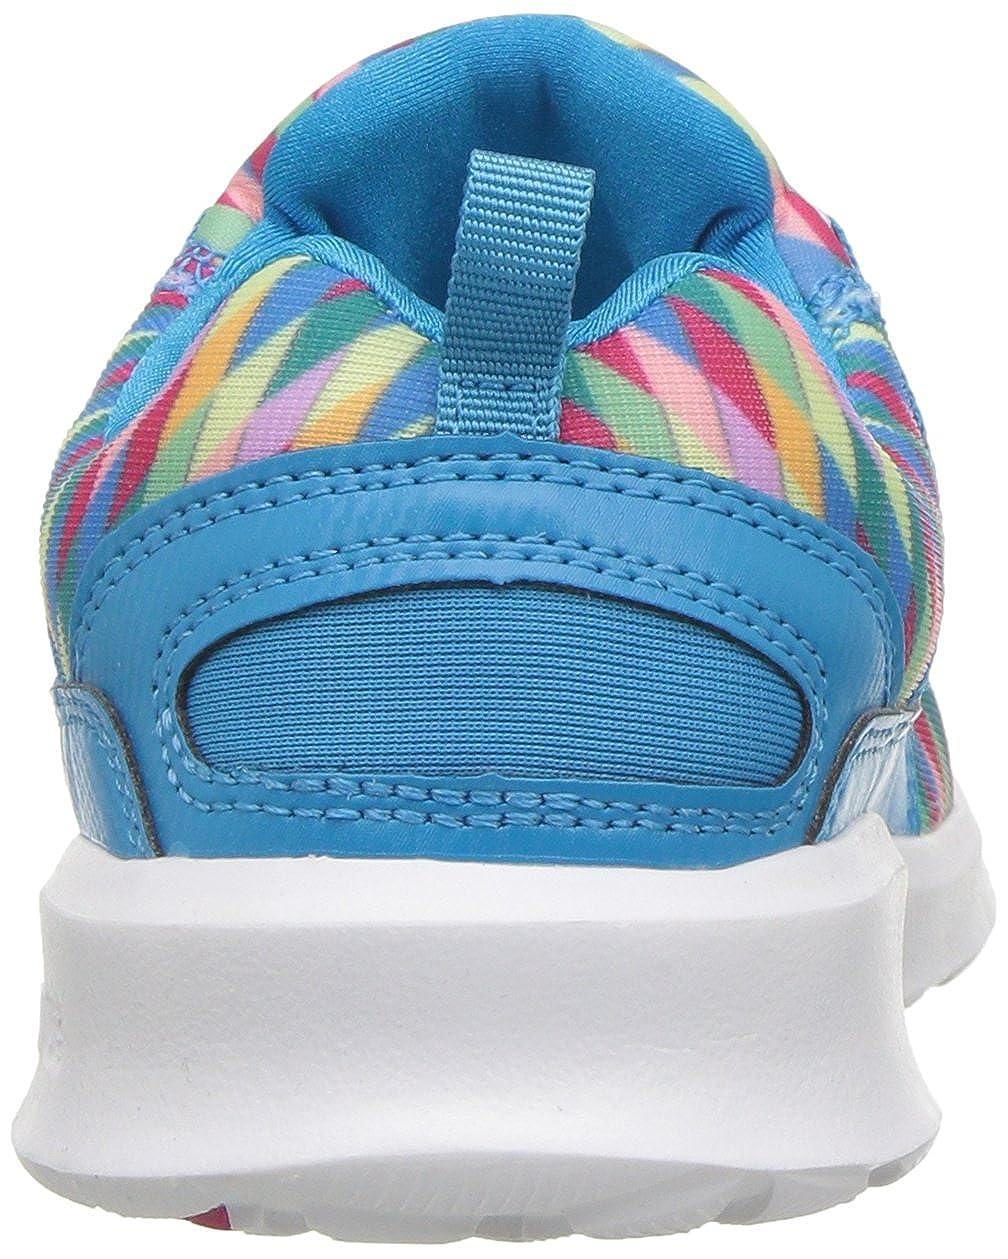 DC Kids Heathrow SP Skate Shoe ADGS700017